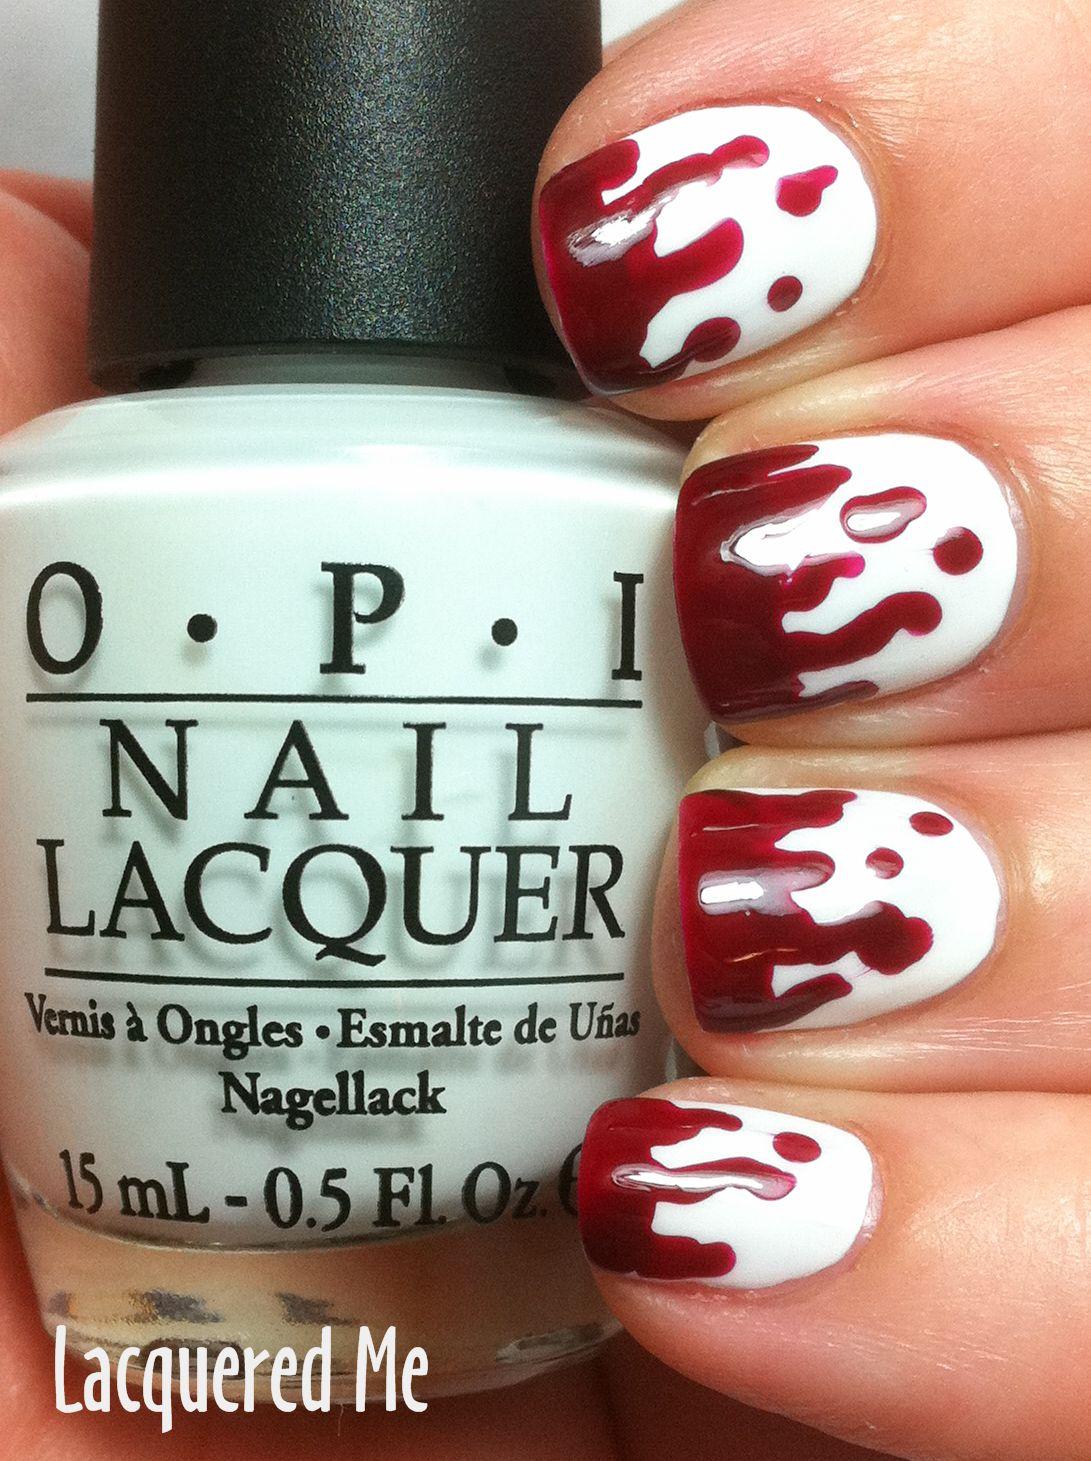 Blood drip Halloween nails. Spooky!